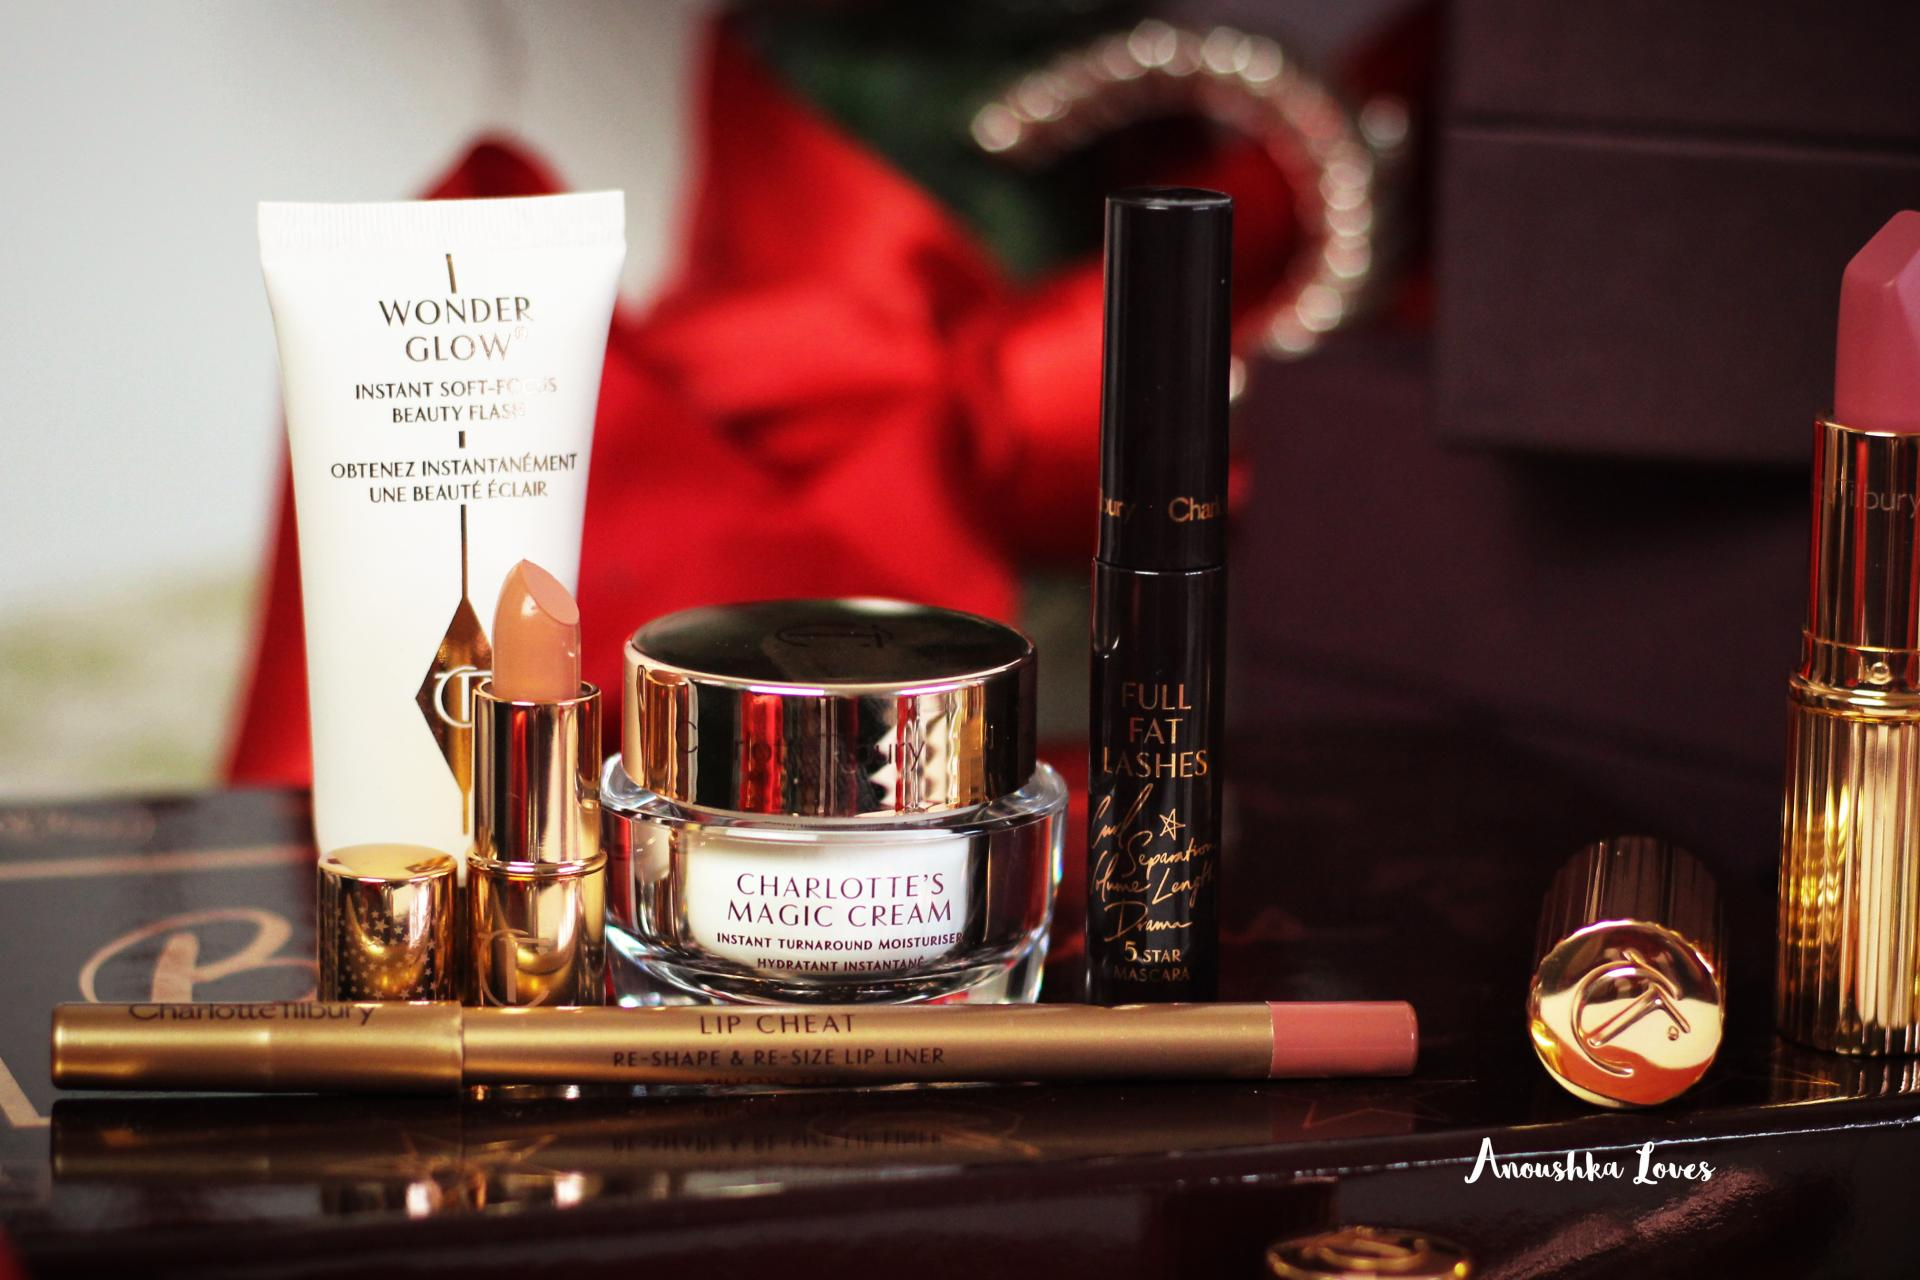 Christmas 2017 A Love for Charlotte Tilbury